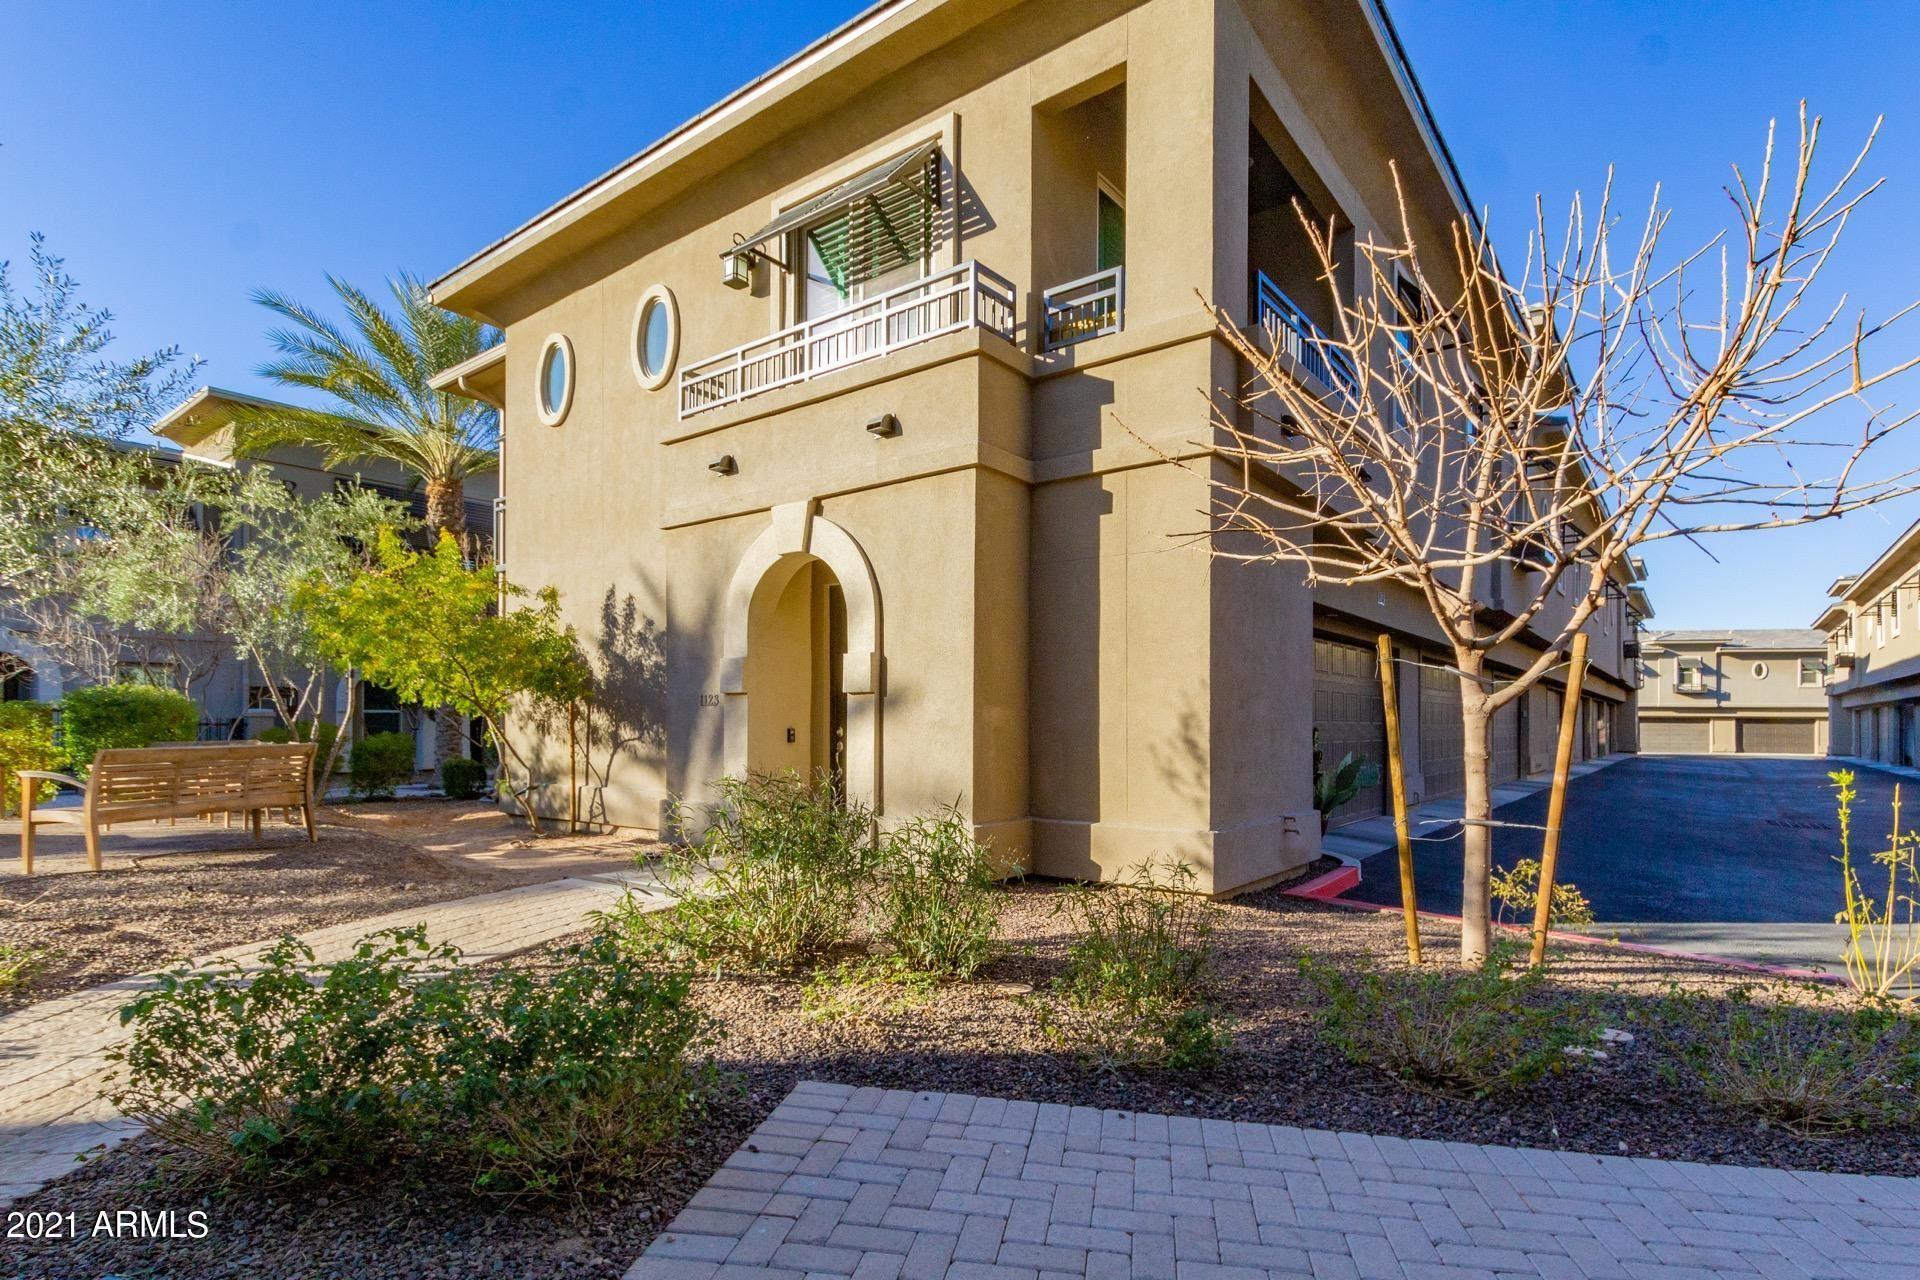 6565 E THOMAS Road #1123, Scottsdale, AZ 85251 - MLS#: 6202078